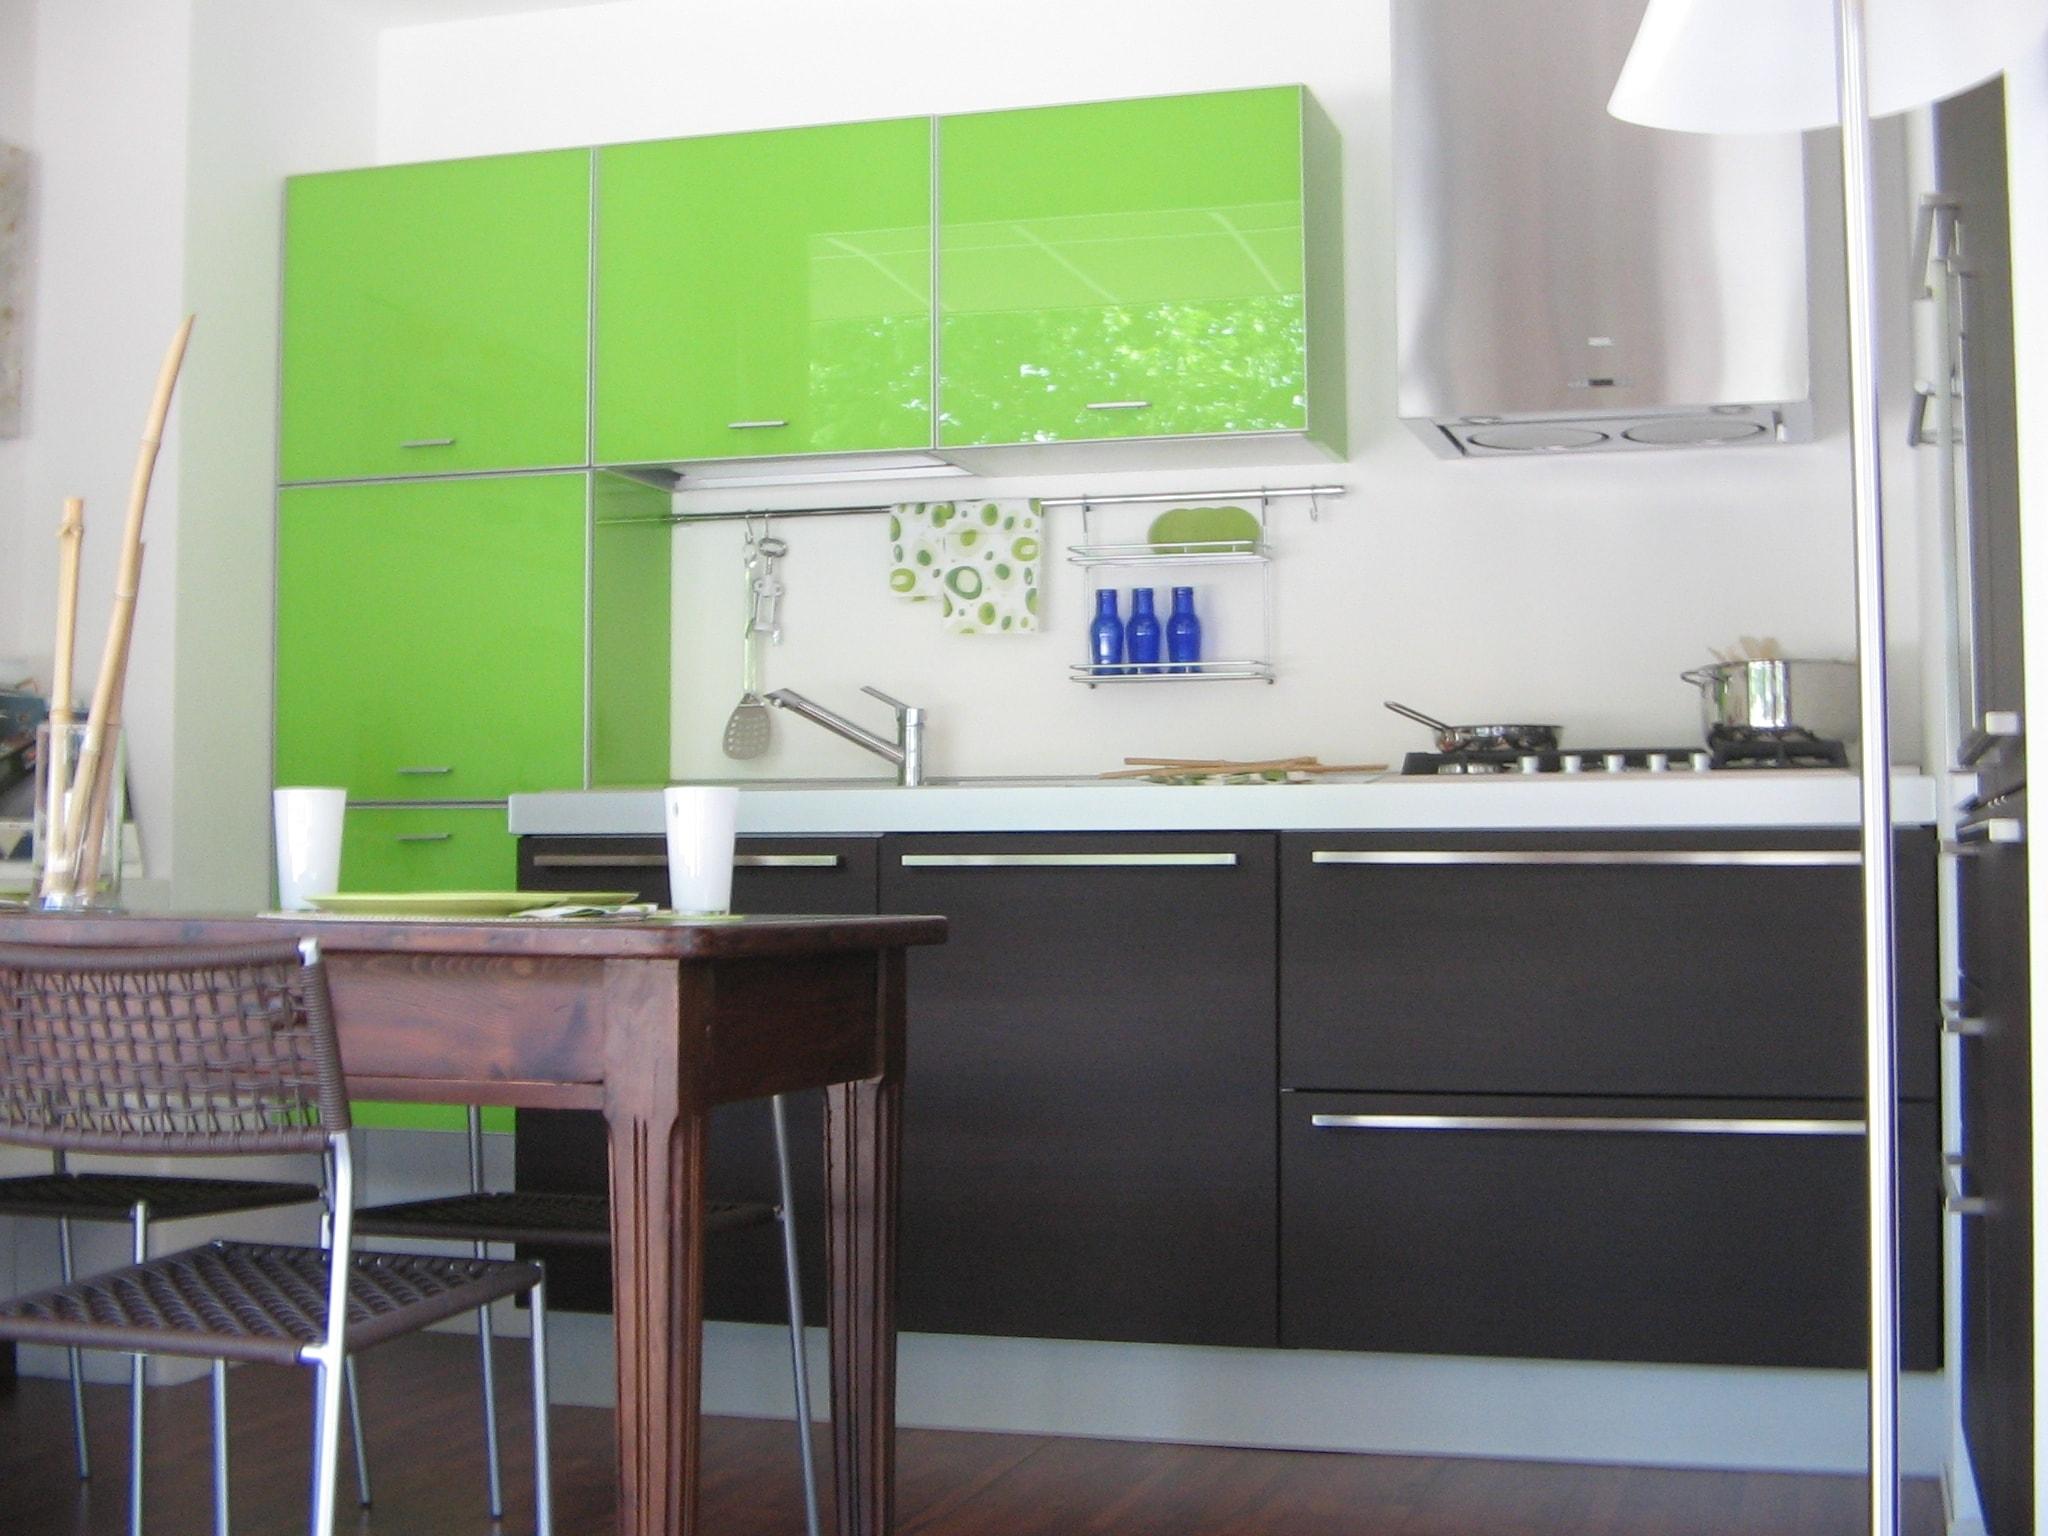 Cucina florida cucine reflex scontato del 52 cucine a - Cucina verde mela ...